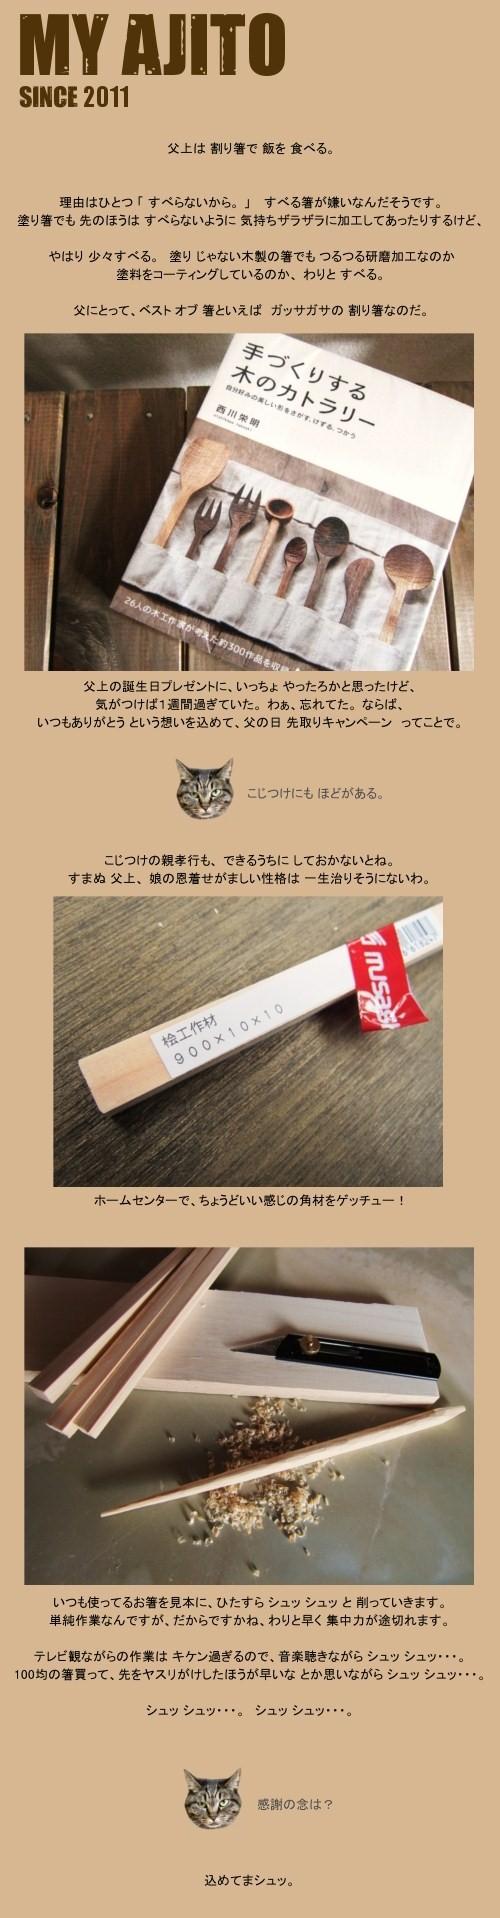 hashi_01.jpg